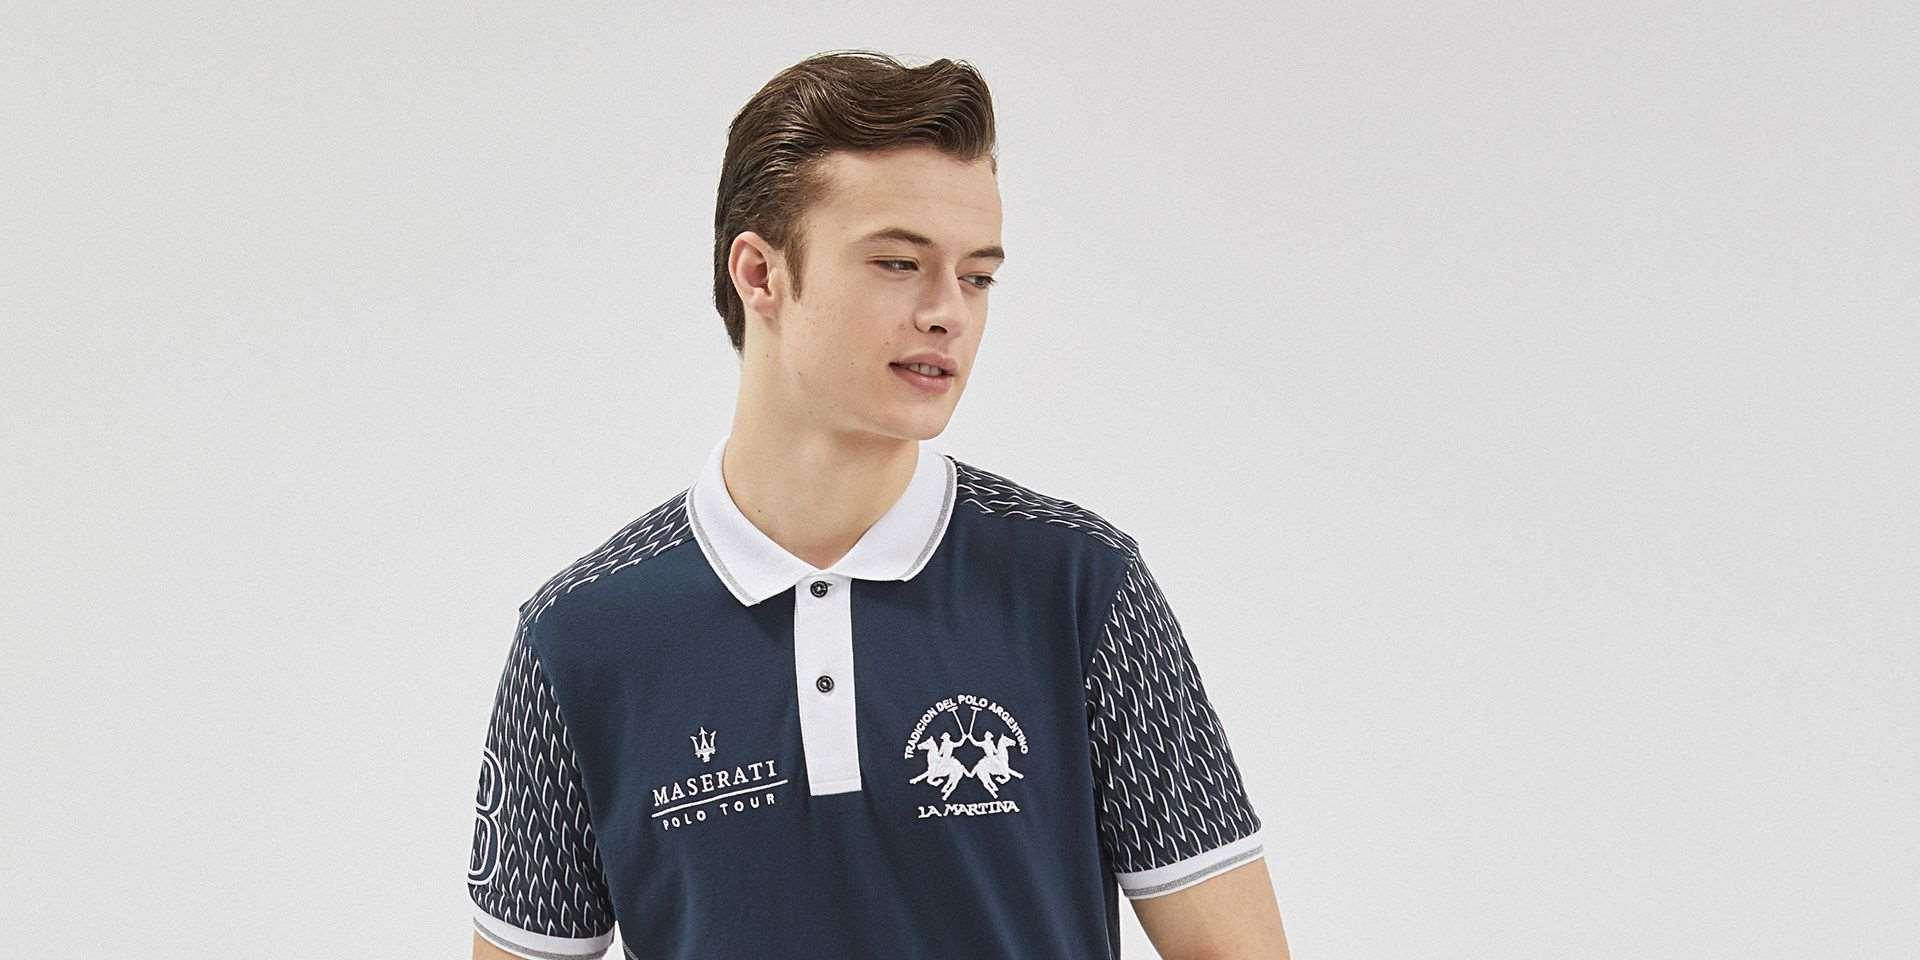 121b0827104 Η φοβερή συνεργασία της La Martina με τη Maserati για μία νέα συλλογή αθλητικών  ρούχων